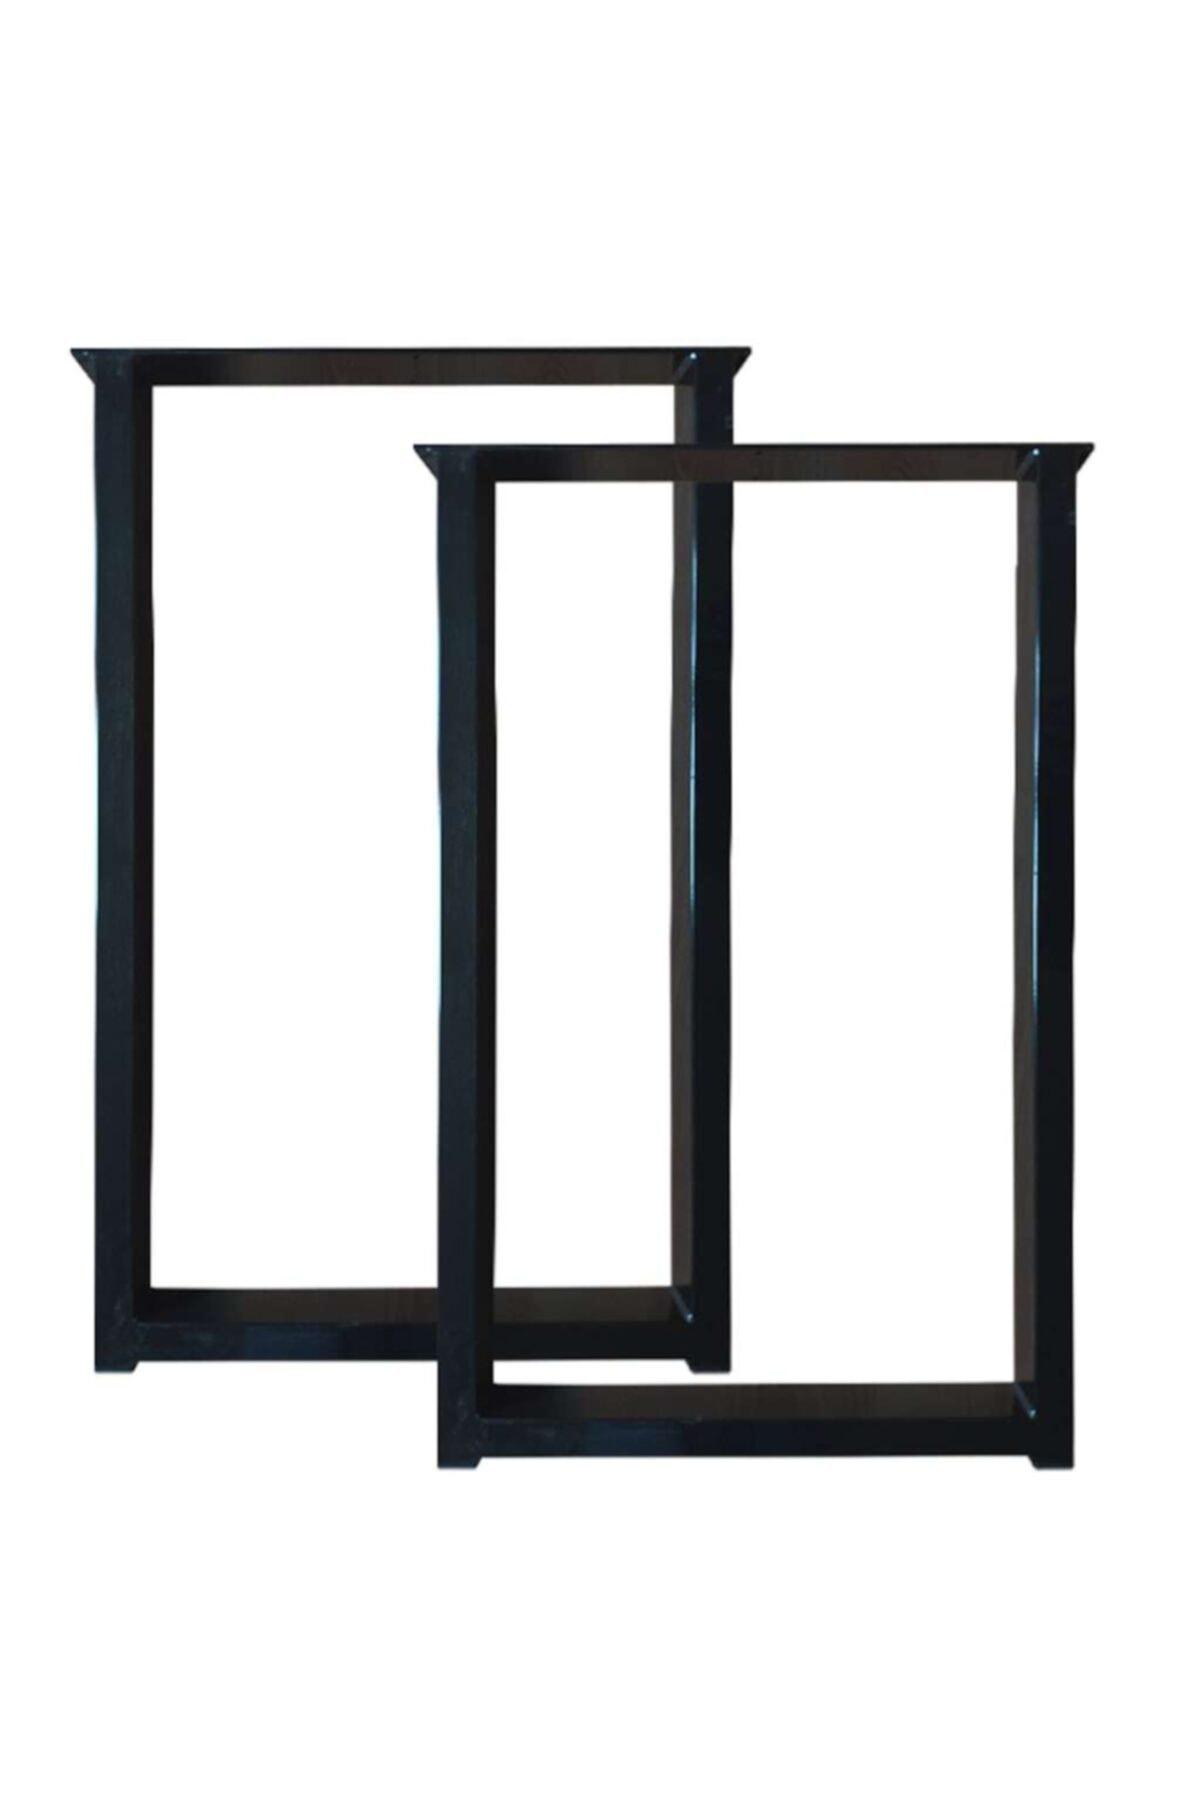 İlgi Trafik Metal Siyah Kare Masa Ayağı 60x70 cm 2 Adet